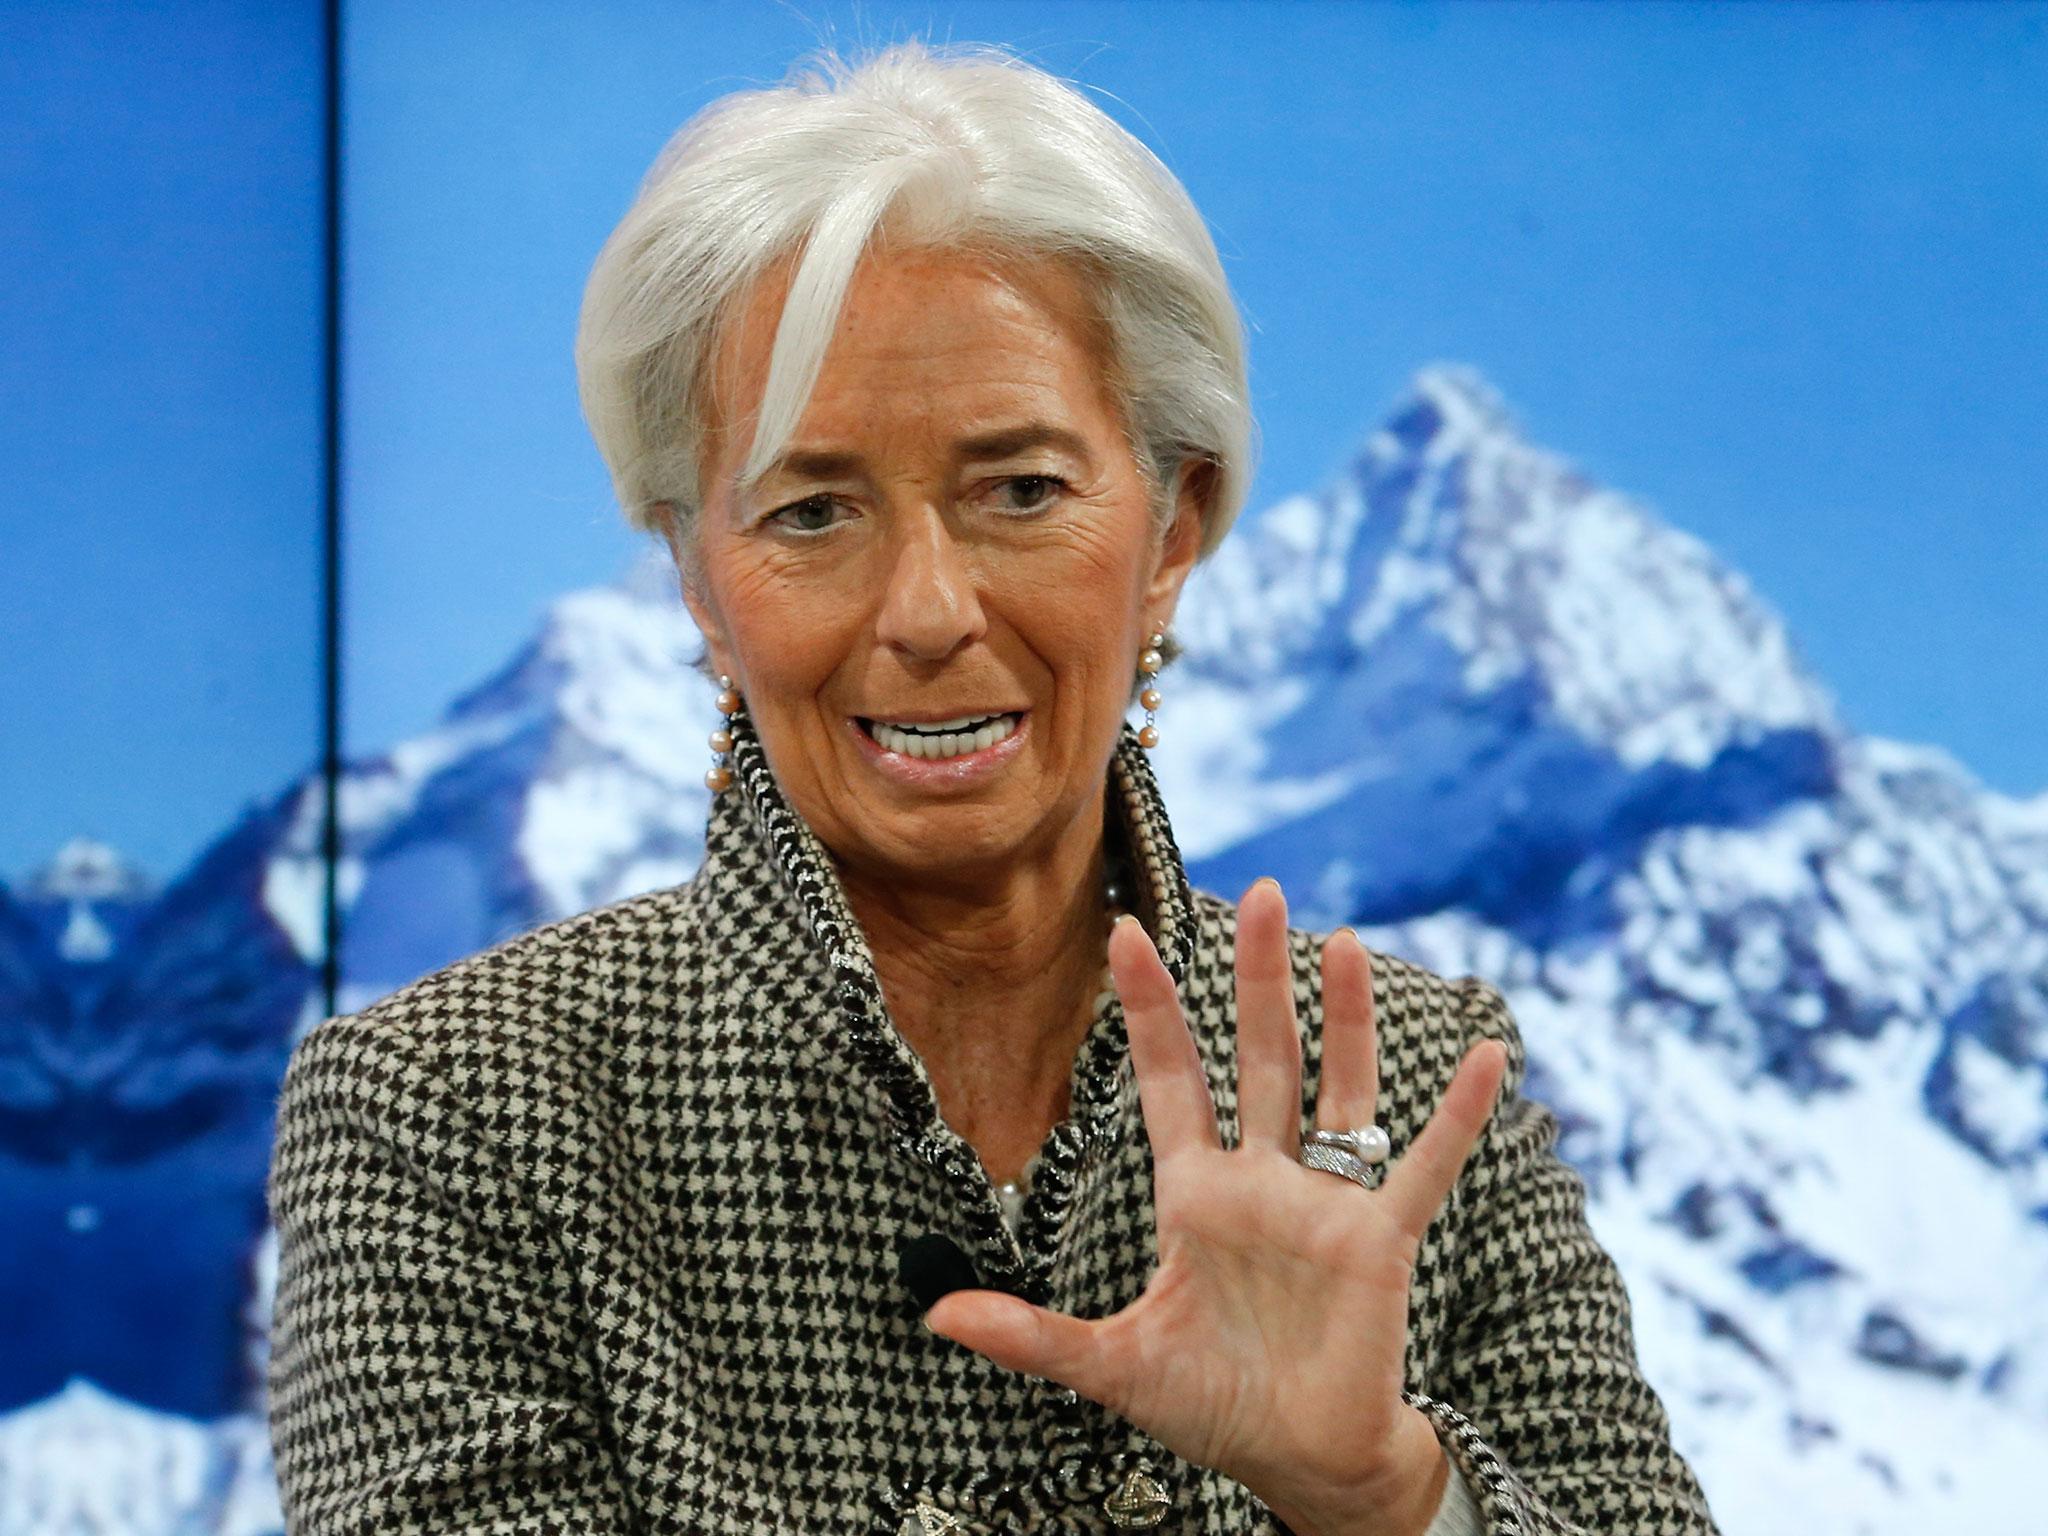 Davos: IMF's Christine Lagarde says 'I told you so' on